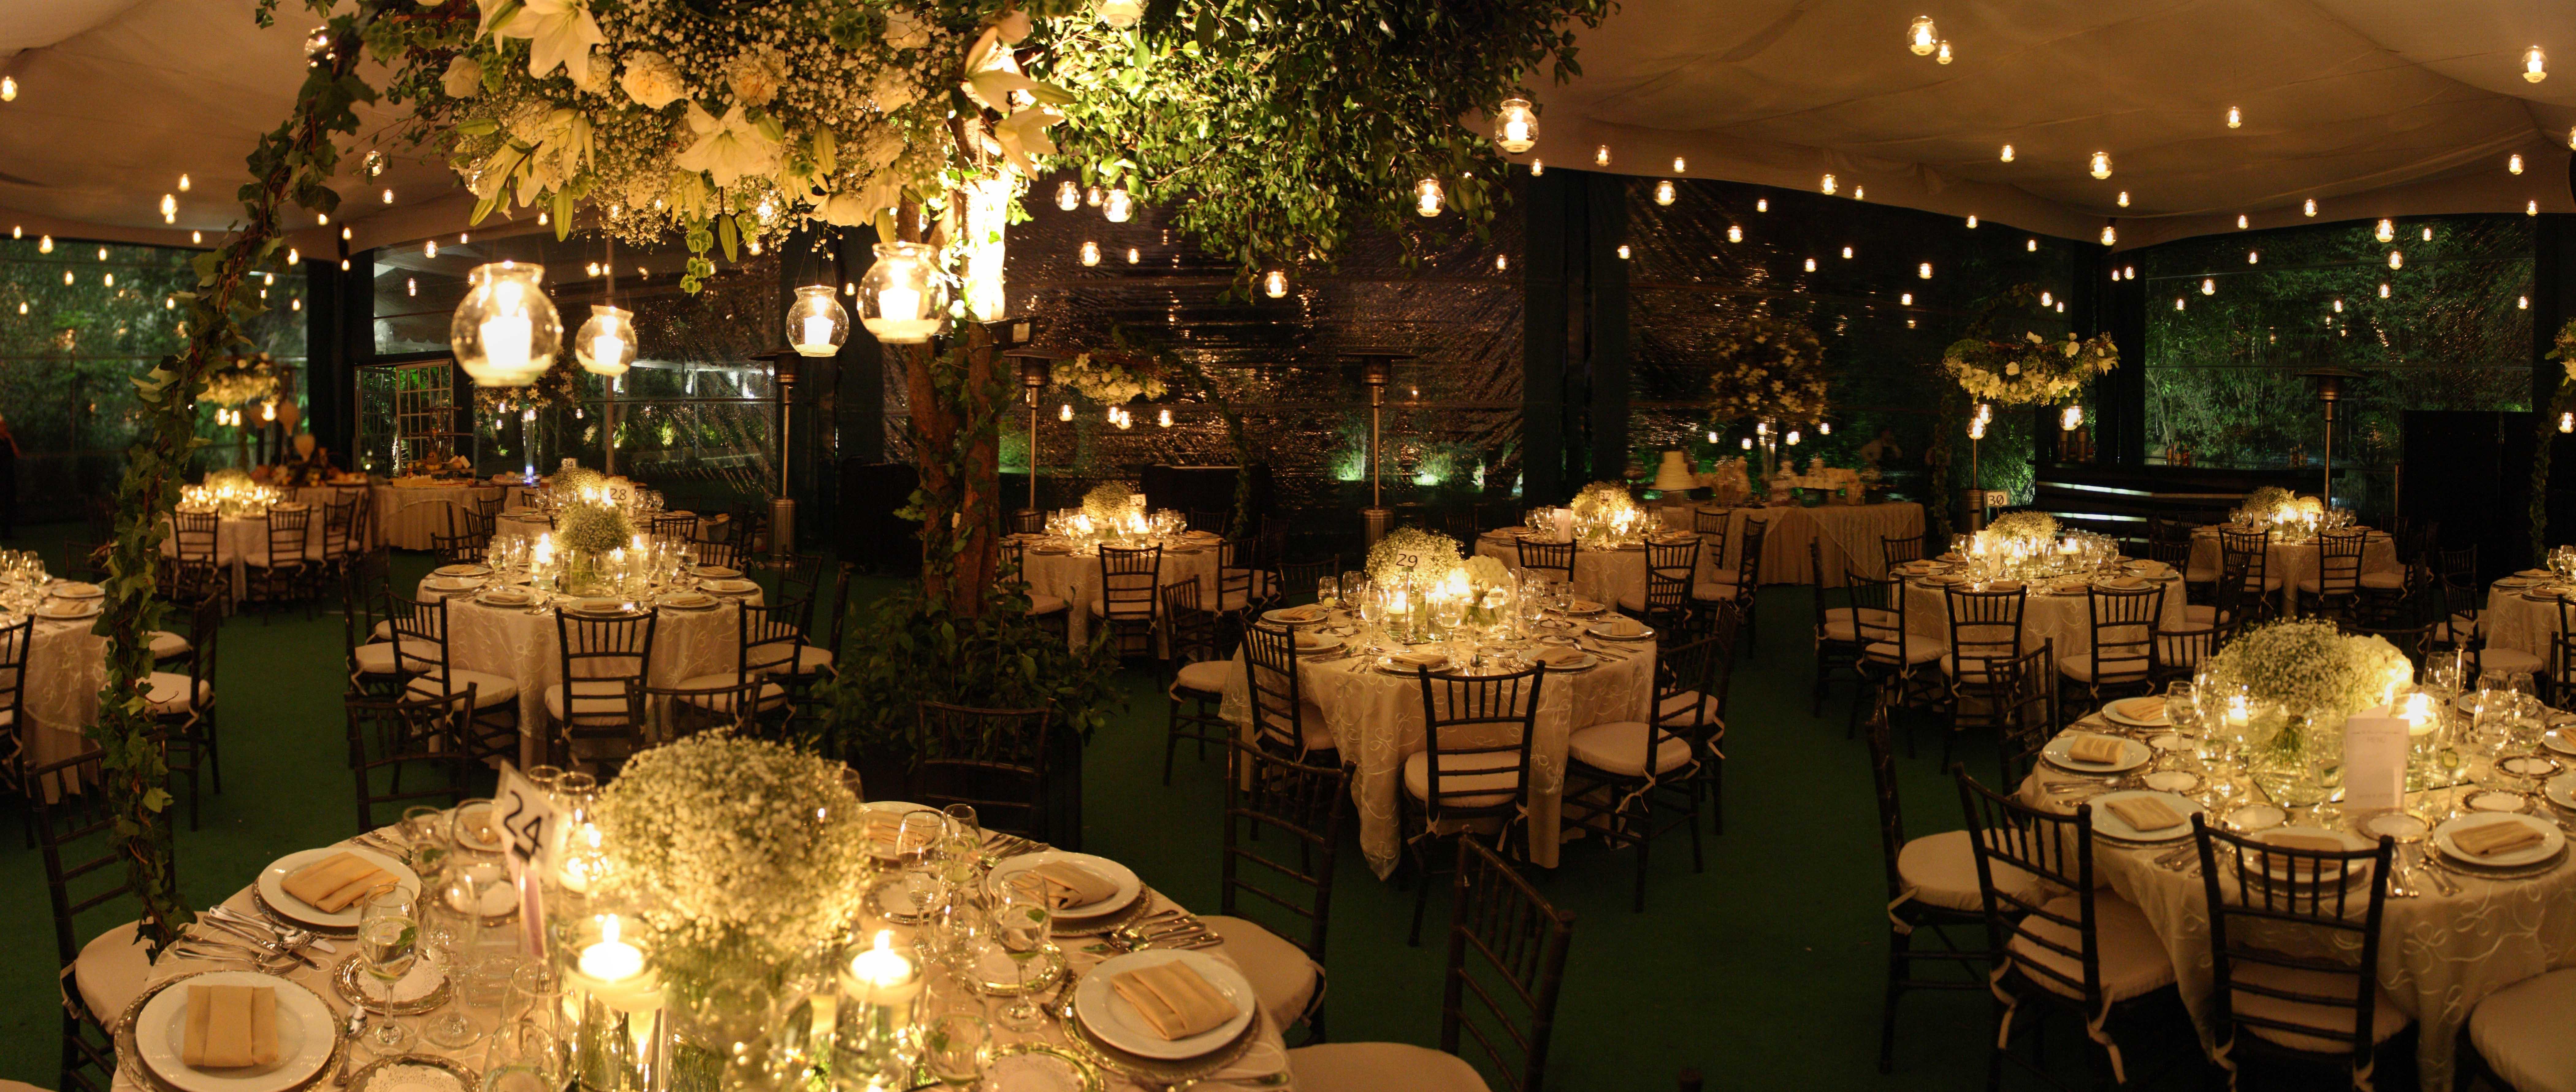 Banquetes corregidor noche for Jardin quinta corregidor